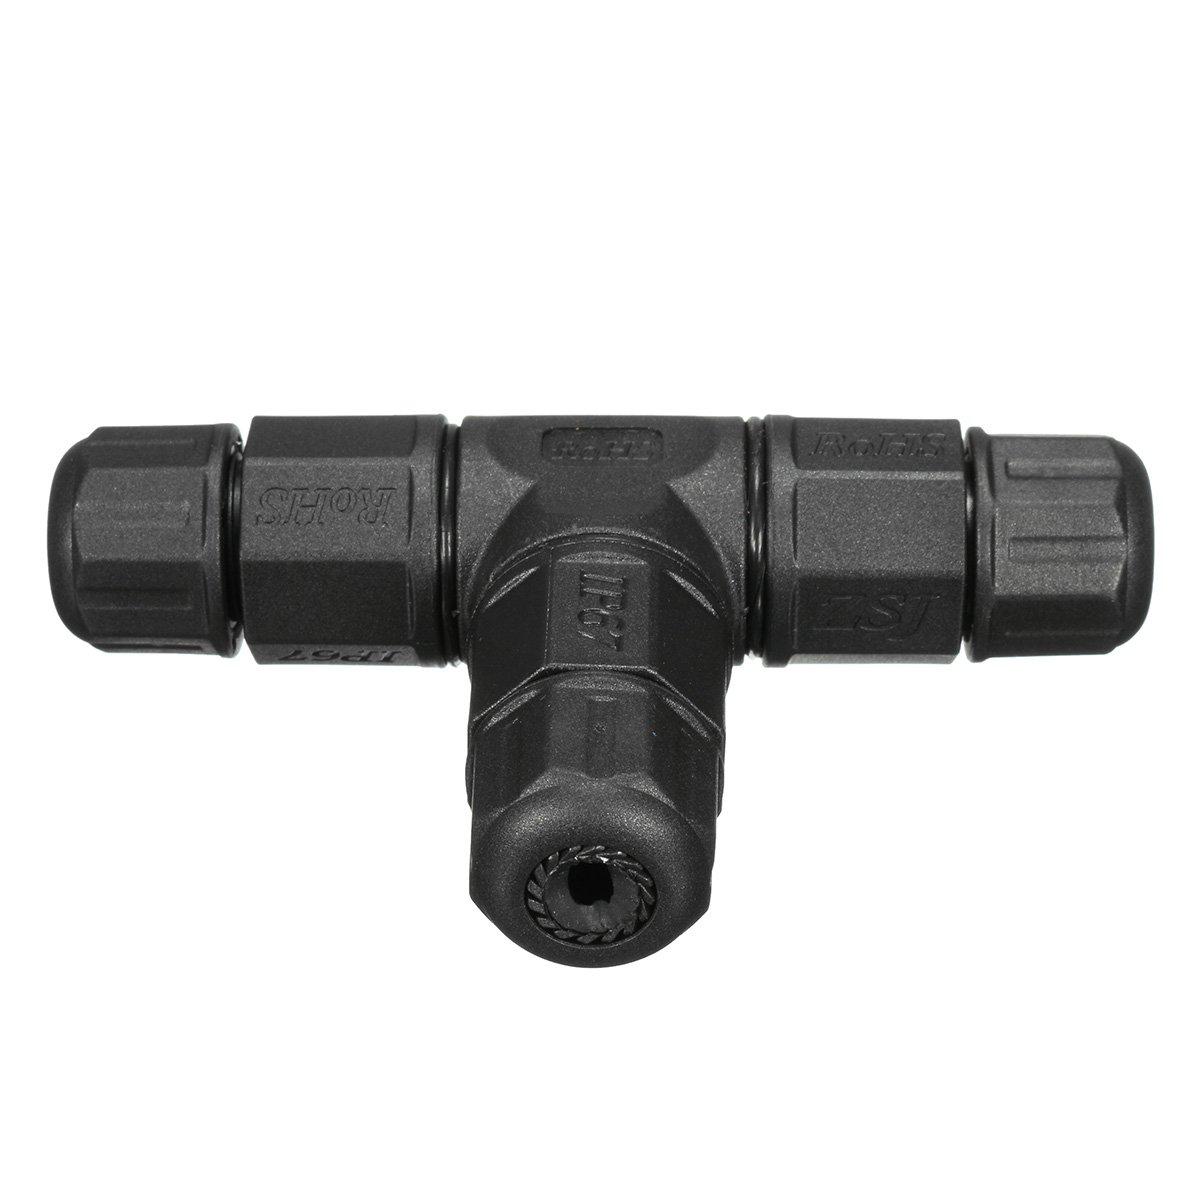 IP67 3 Pin Waterproof Cable Connector 220V-380V Solar Garden Outdoor Junction